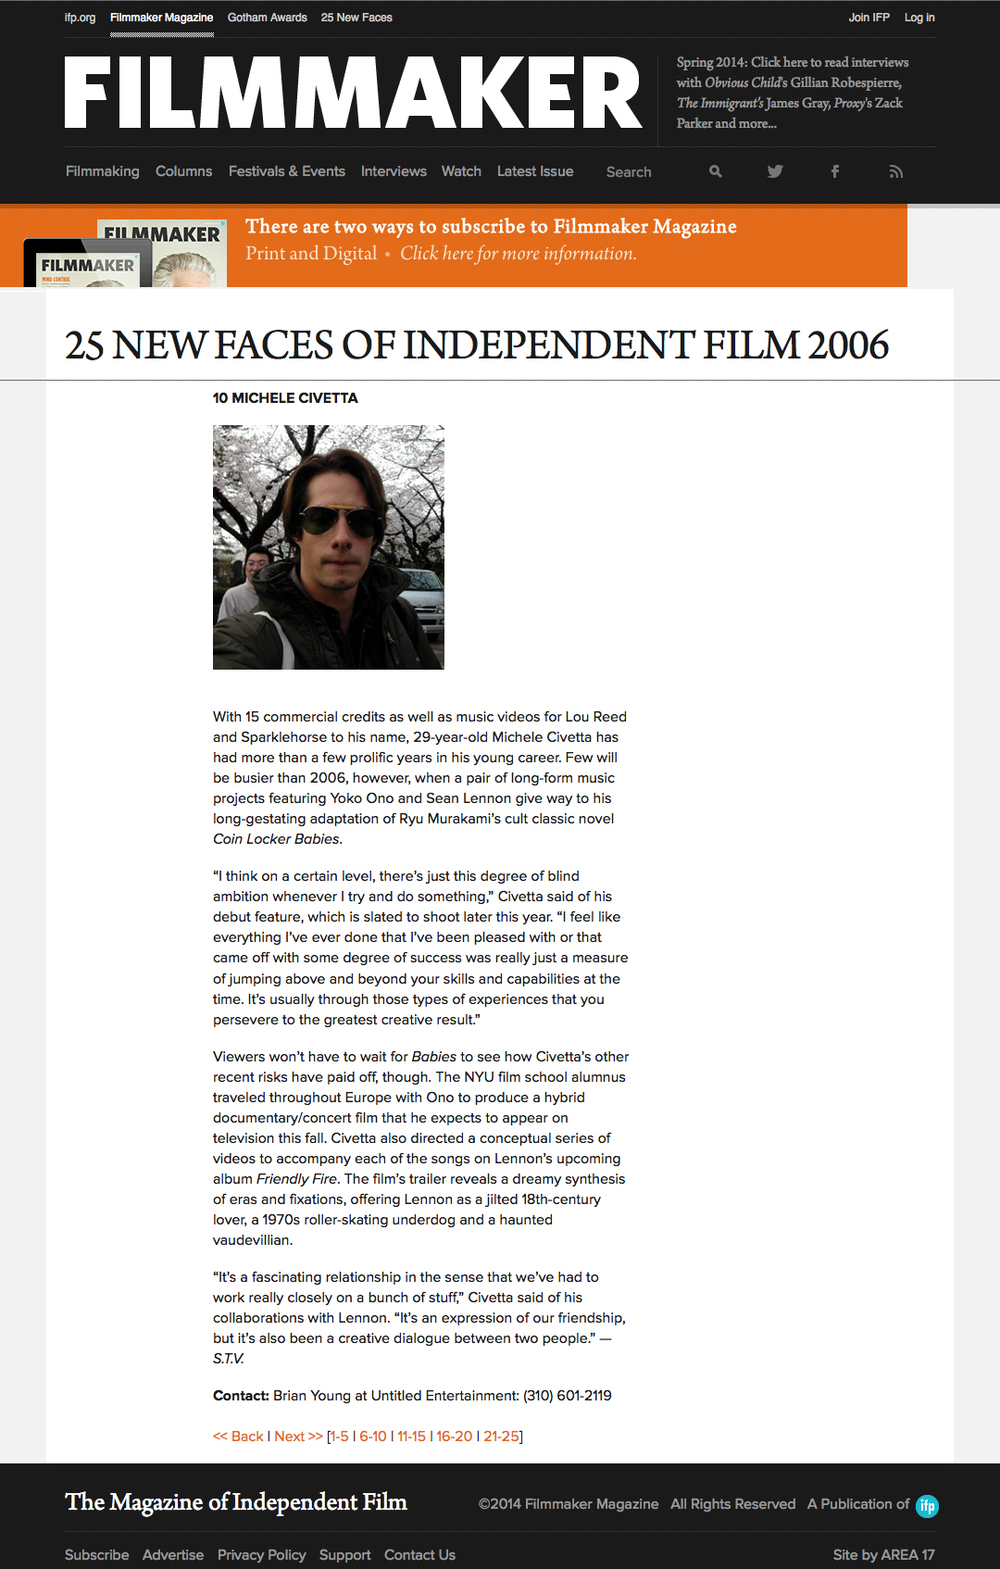 FILMMAKER 2006.jpg